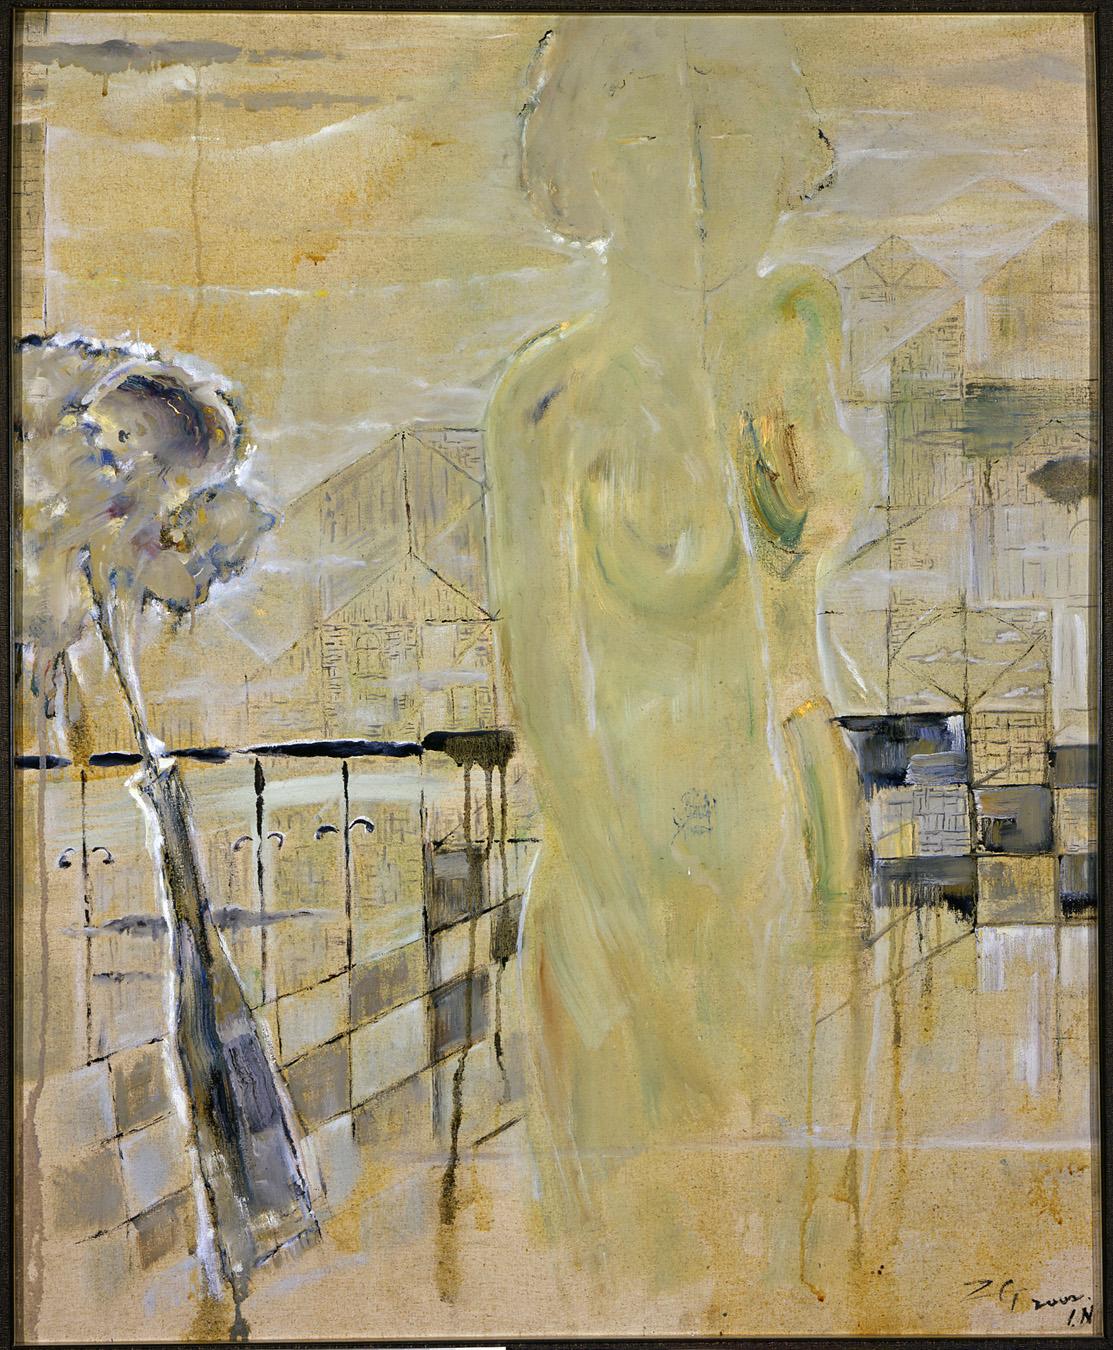 Daylight (sold)